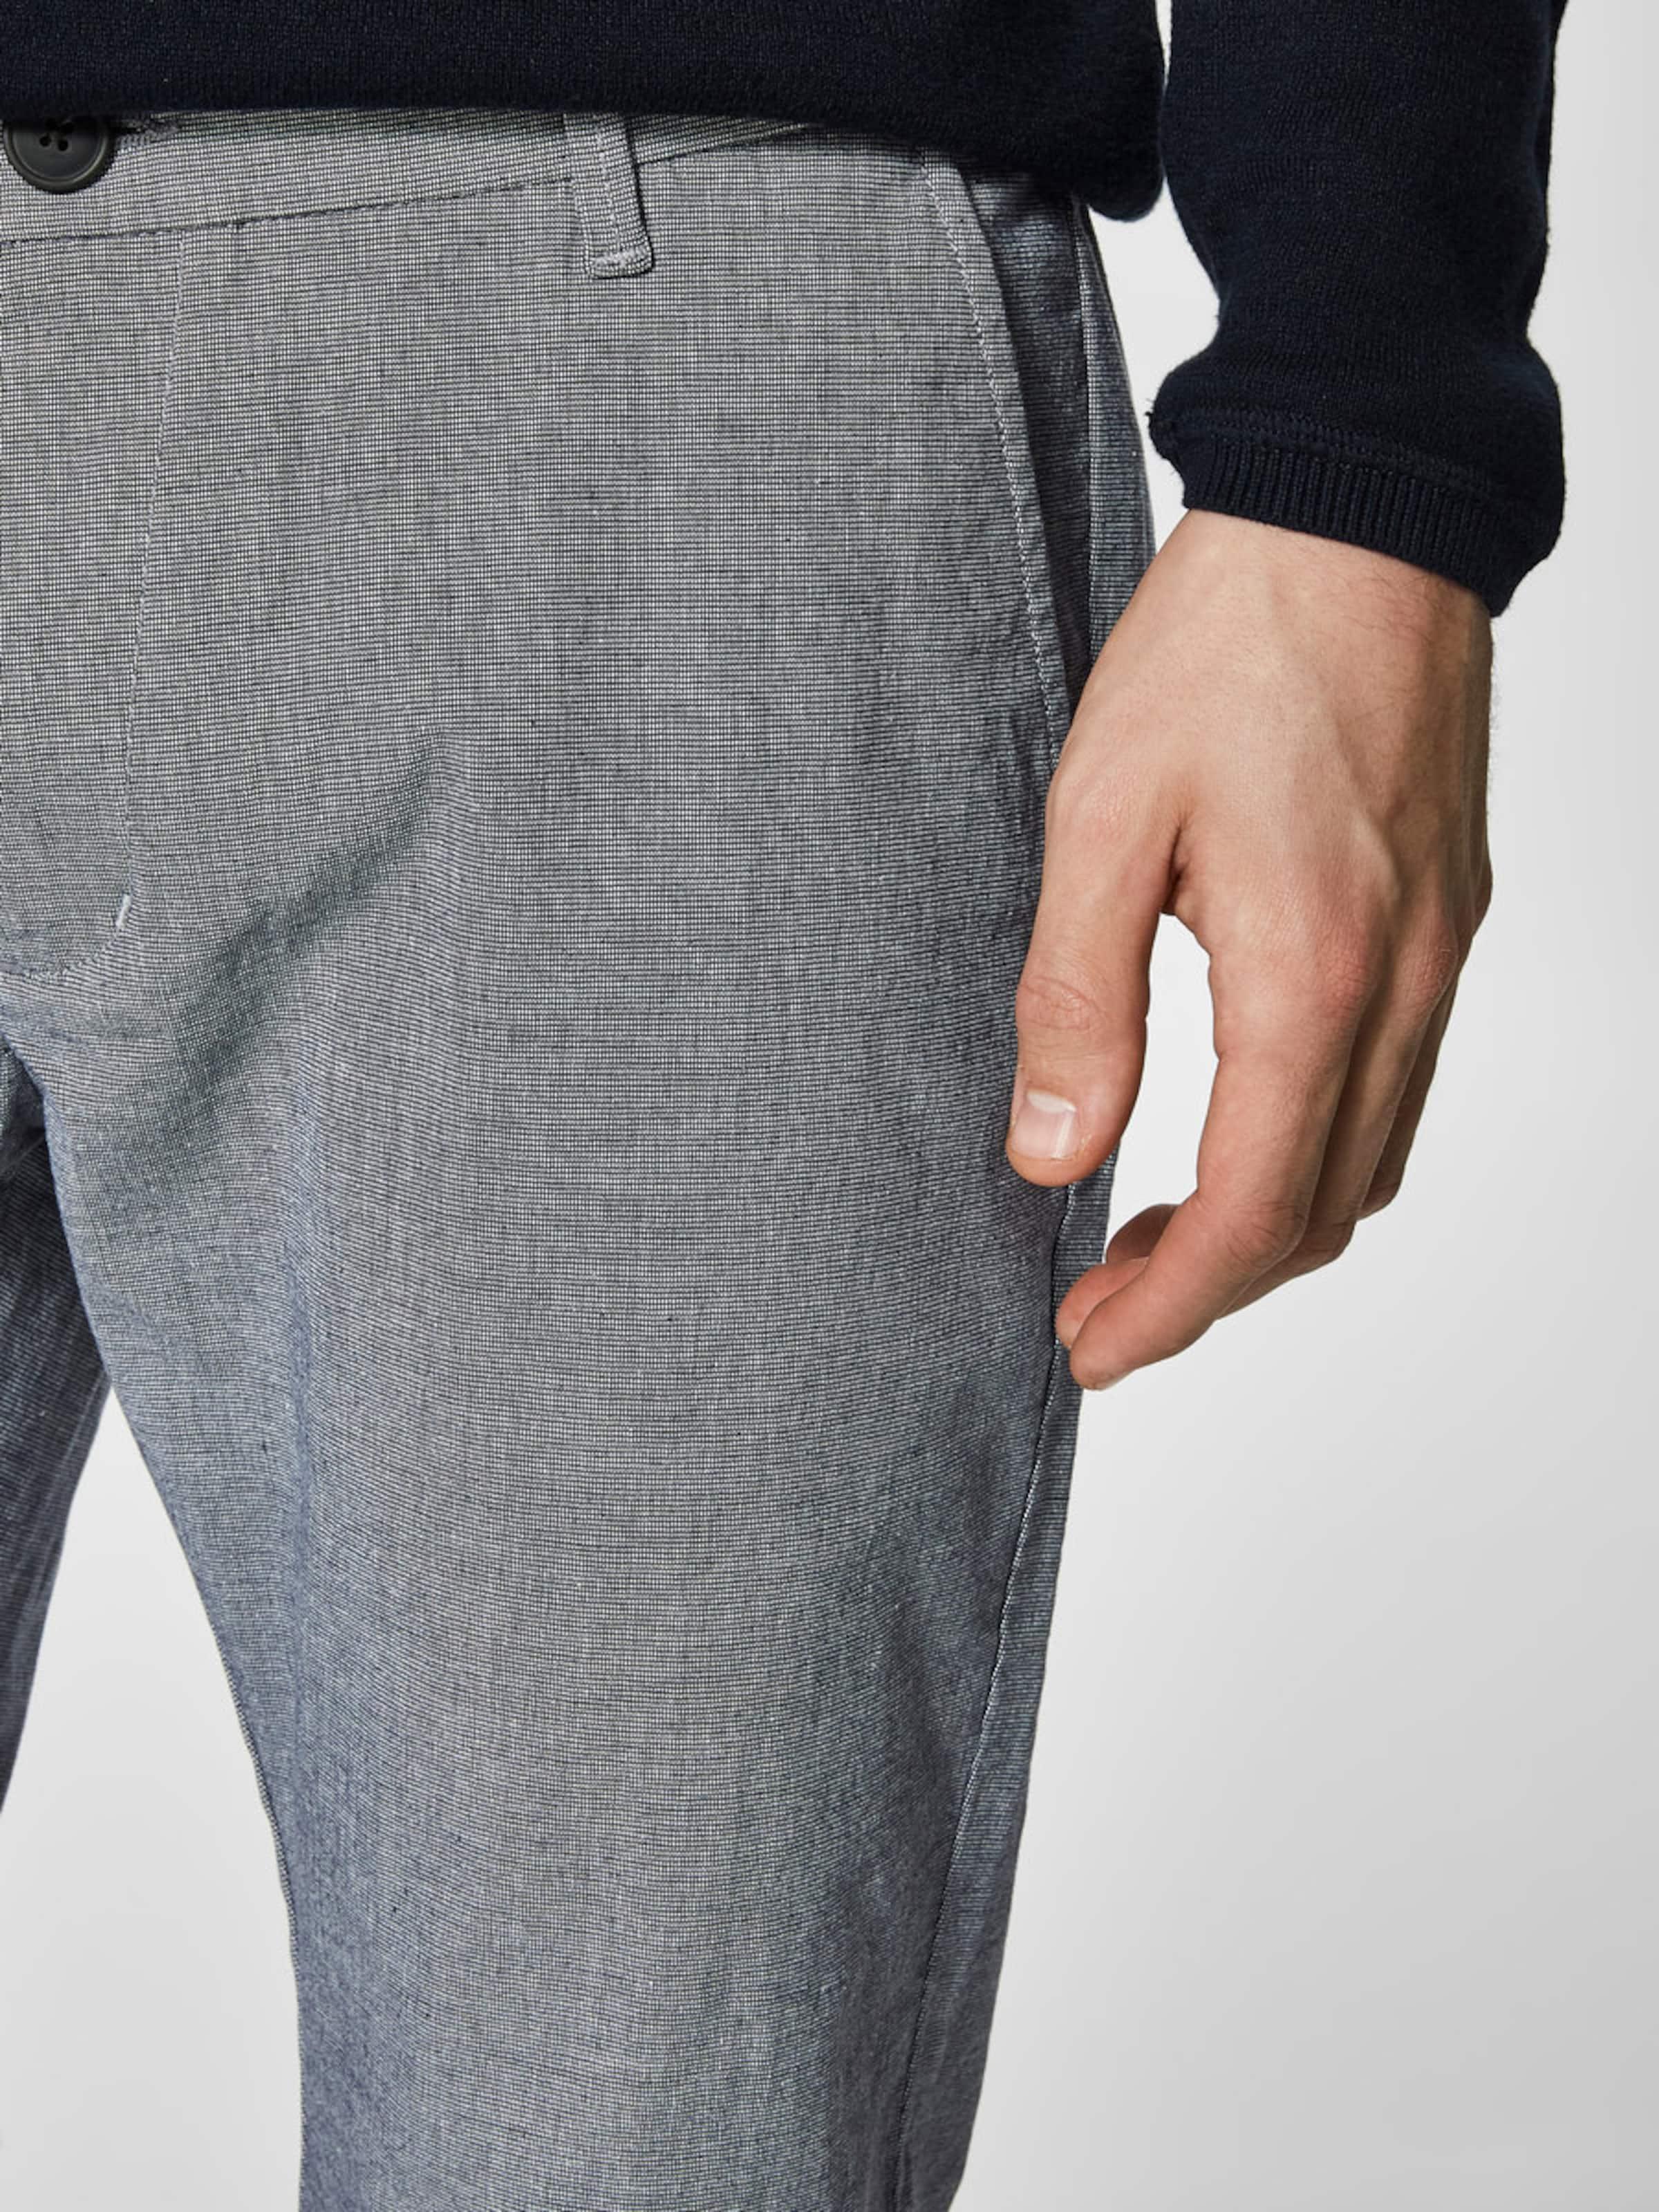 SELECTED HOMME Hose Slim Fit 100% Original Zum Verkauf fZ5gR